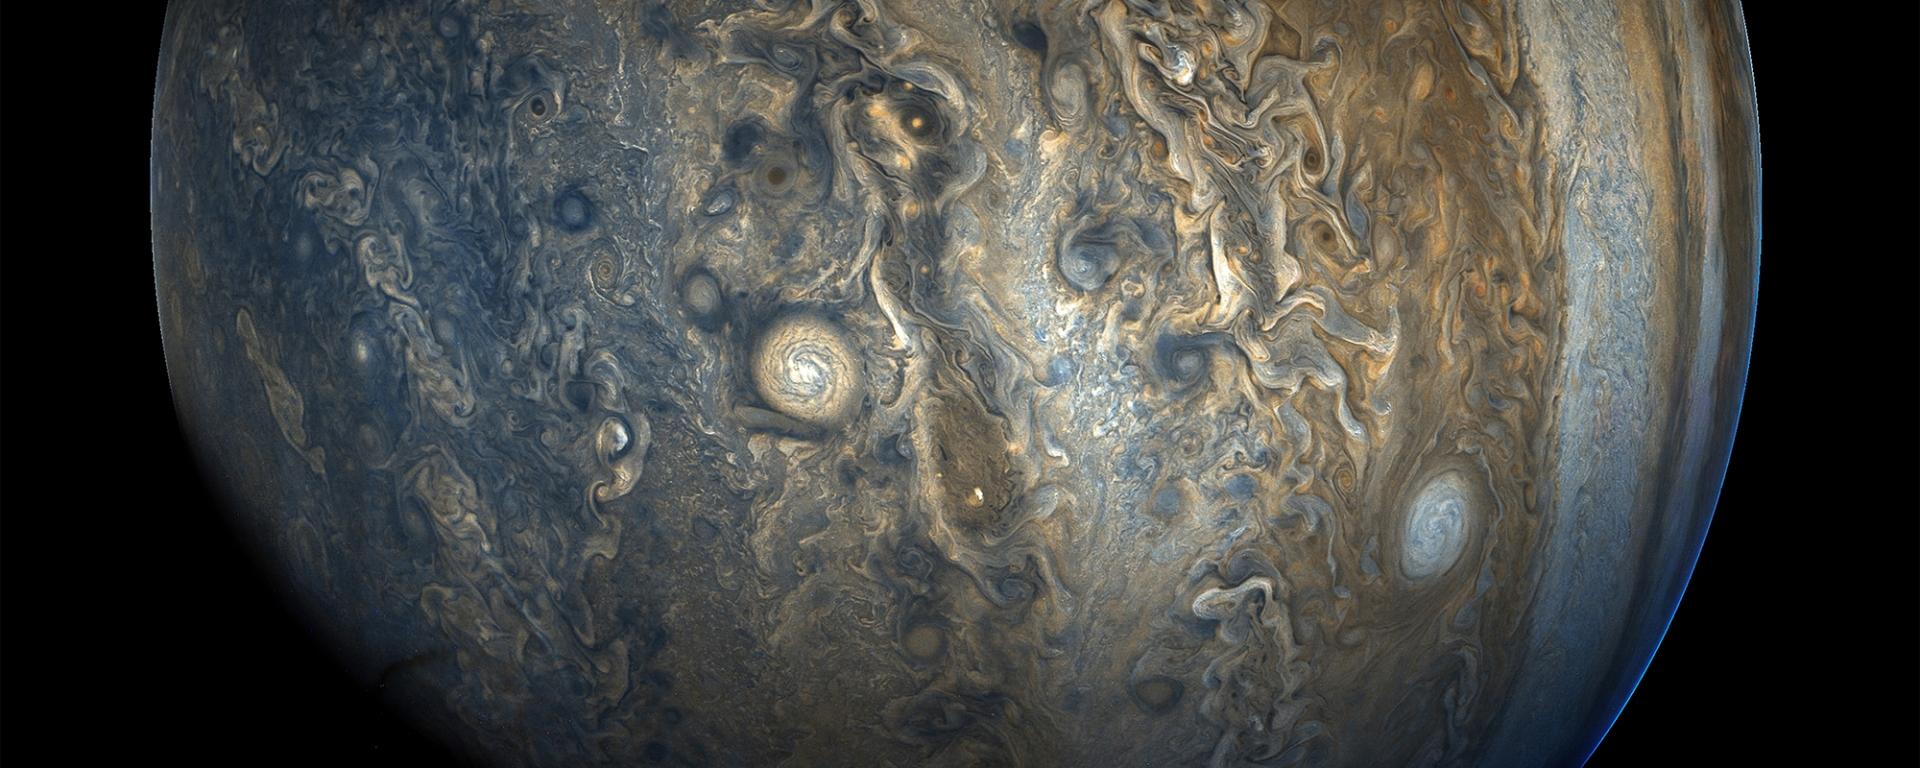 Jupiter Retrograde In Scorpio March 8th To July 10th I Put A